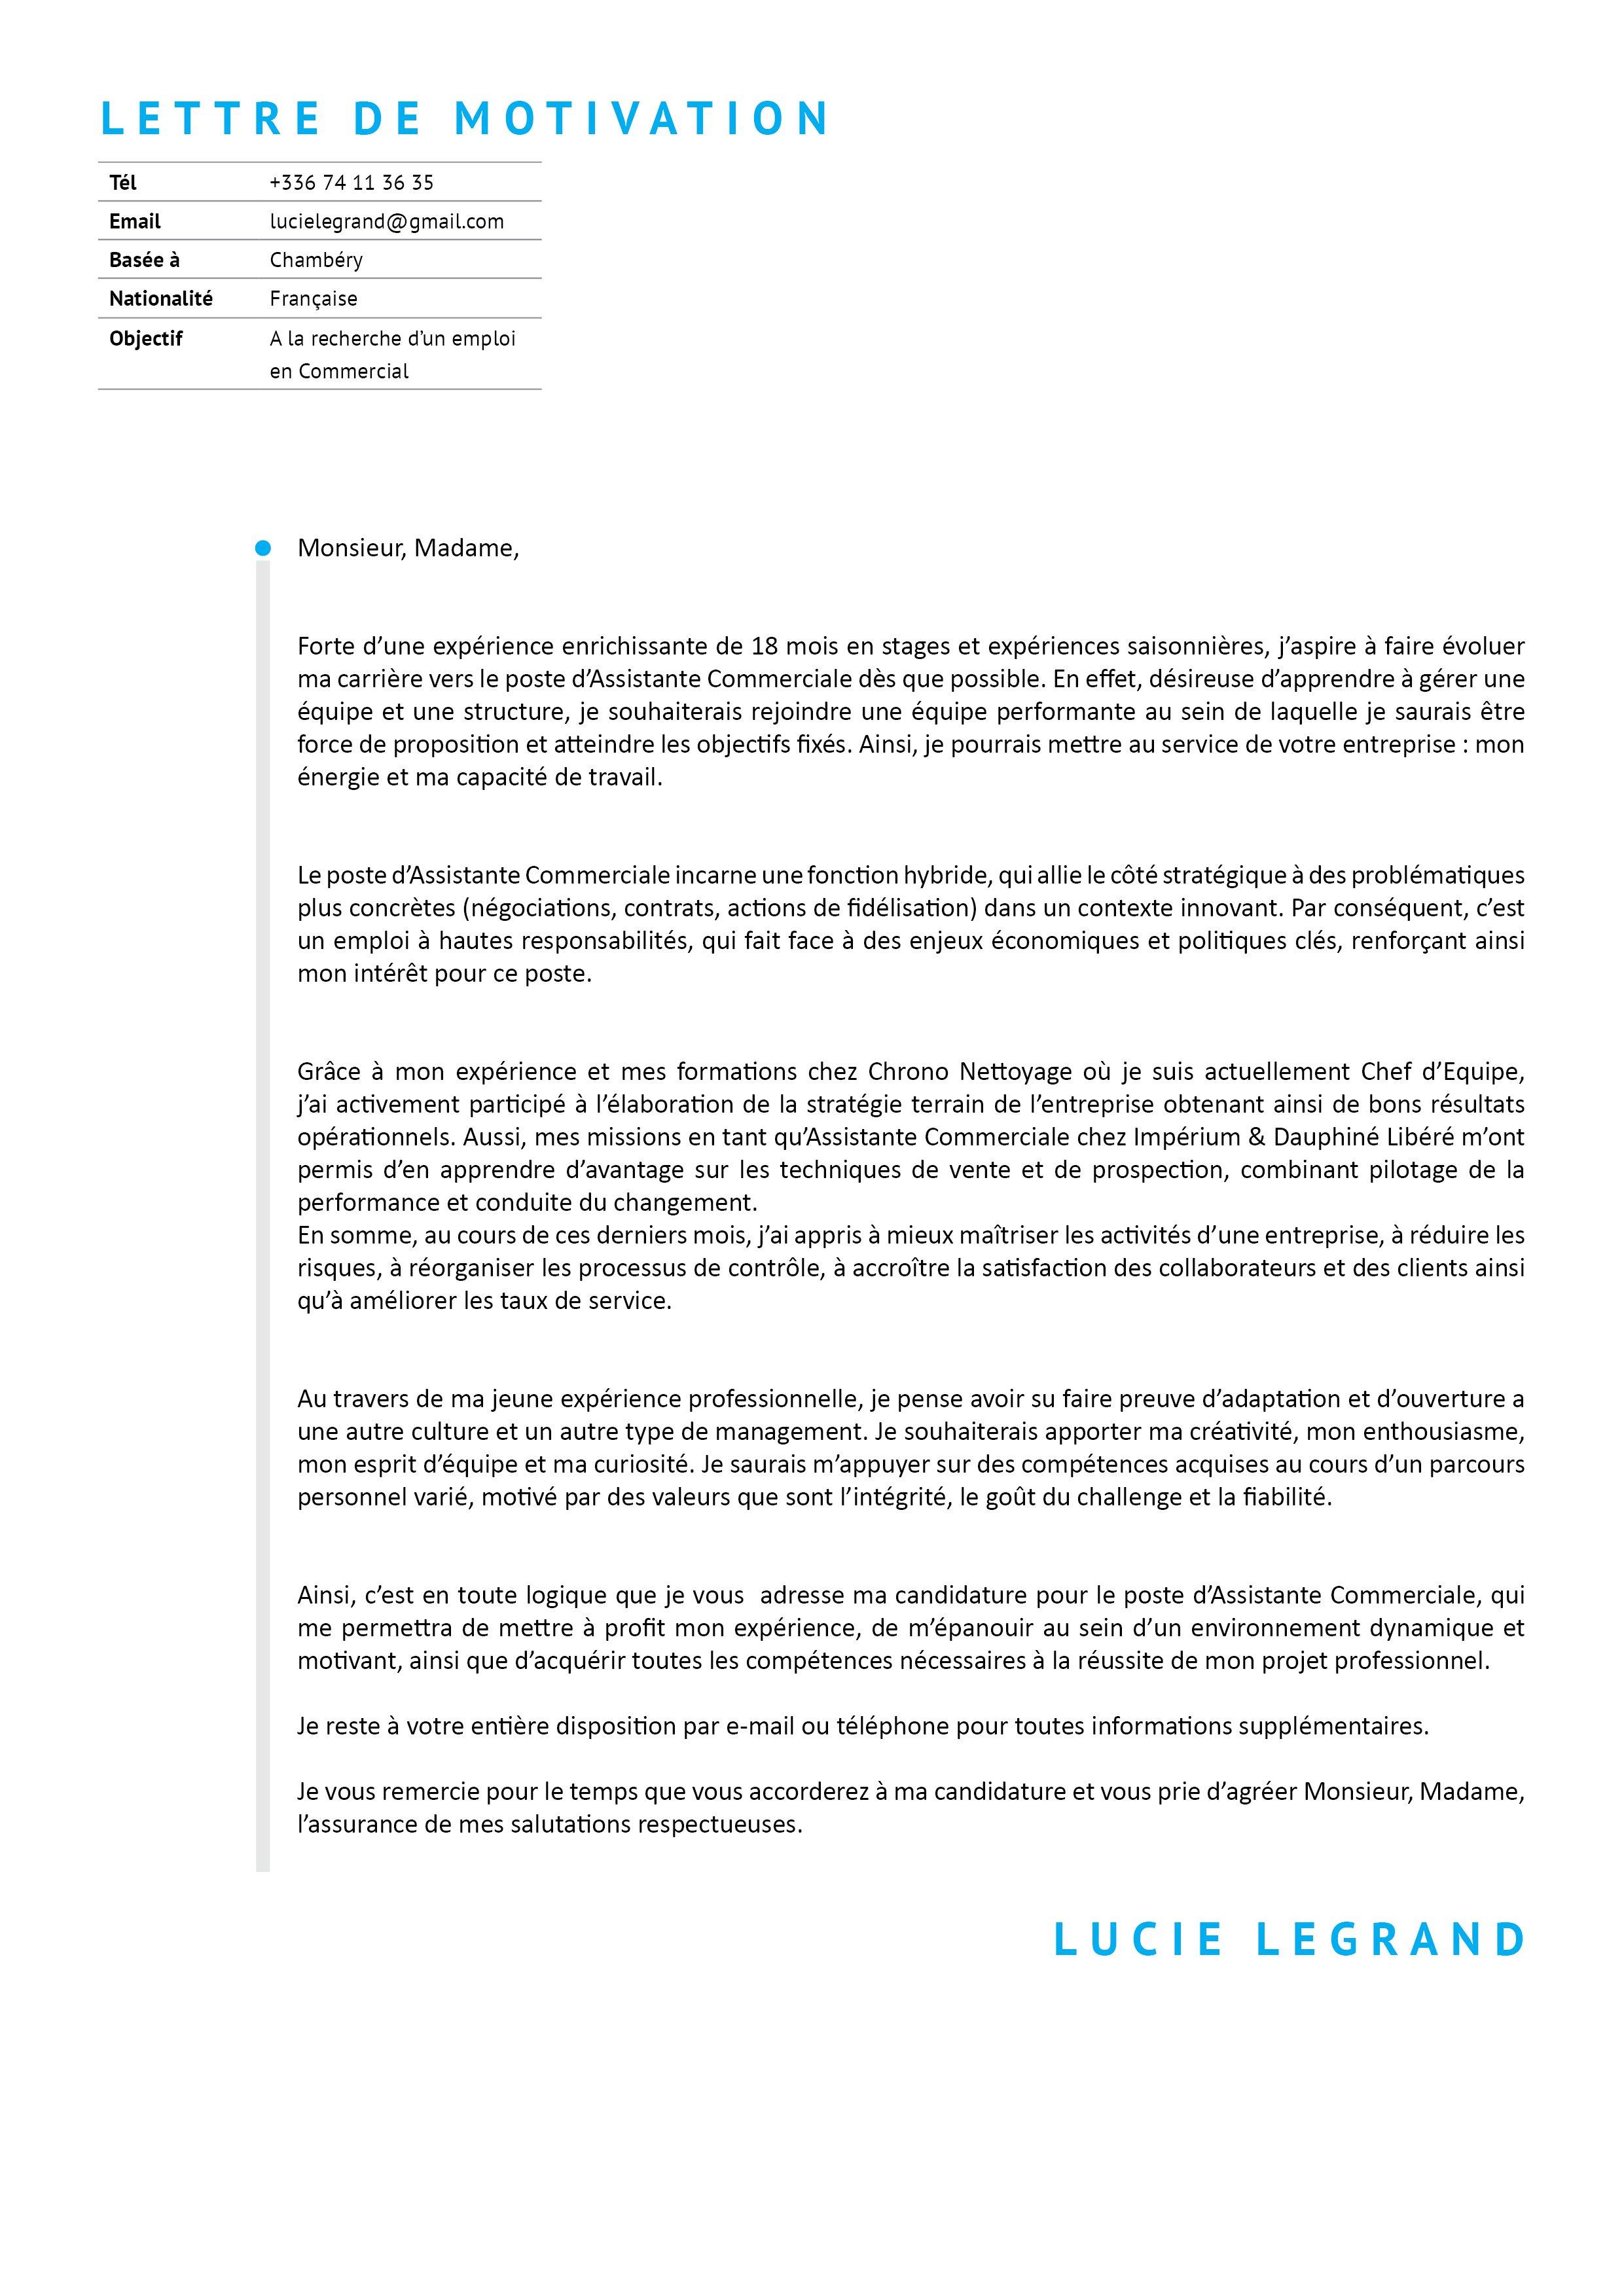 mycvfactory-cover-letter-l-azur-0_ETUJH7l.jpg